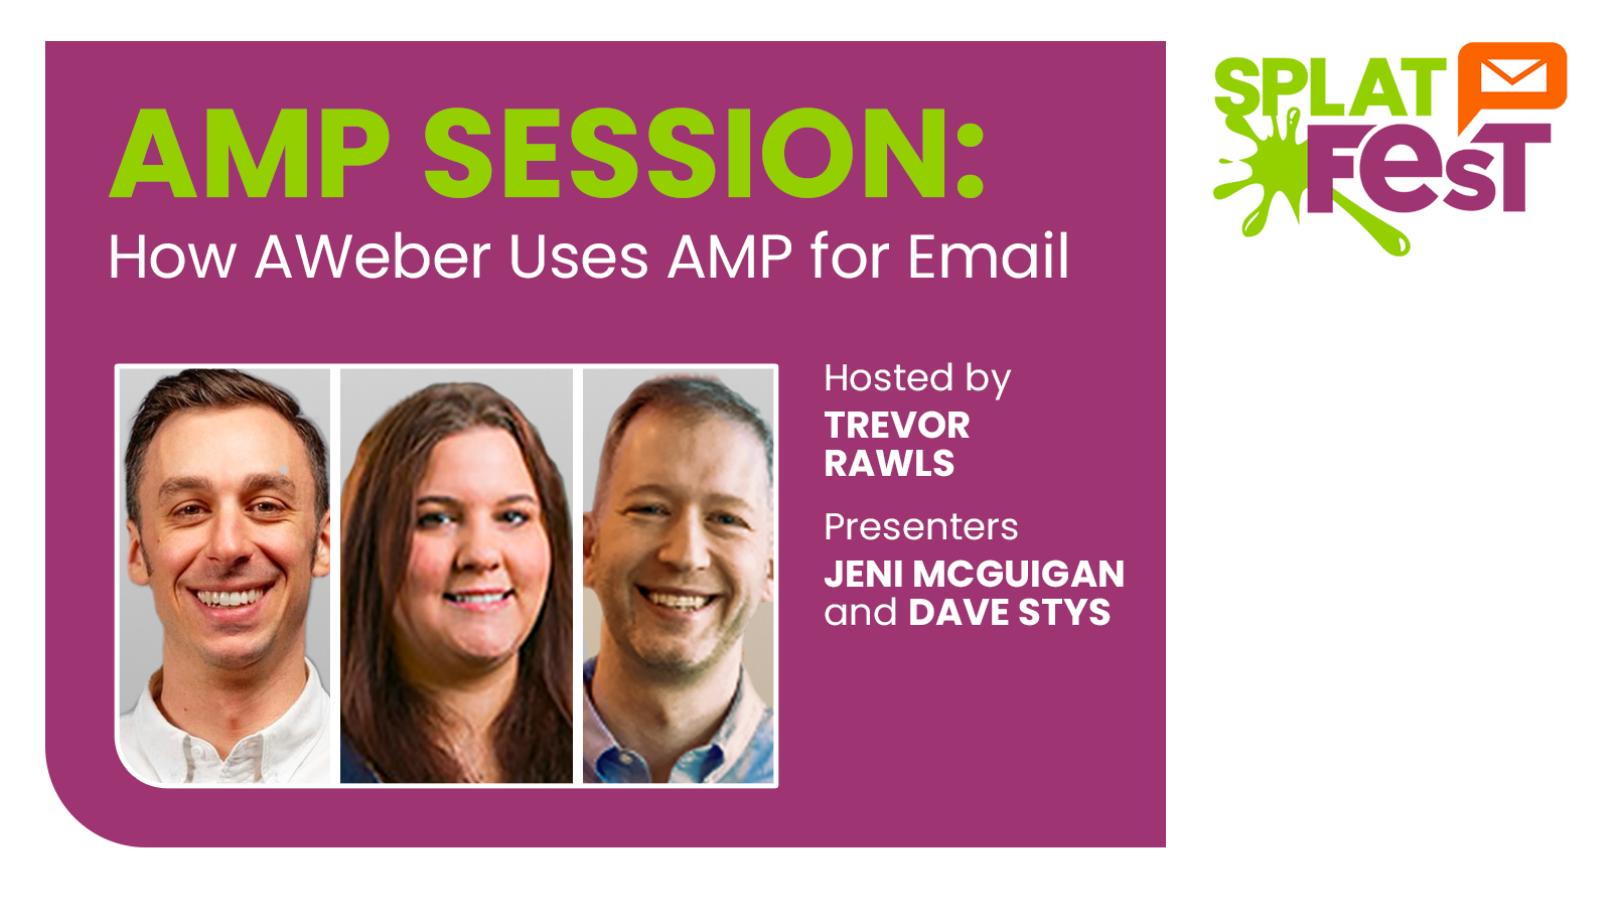 Photos of AWeber team hosting AMP session